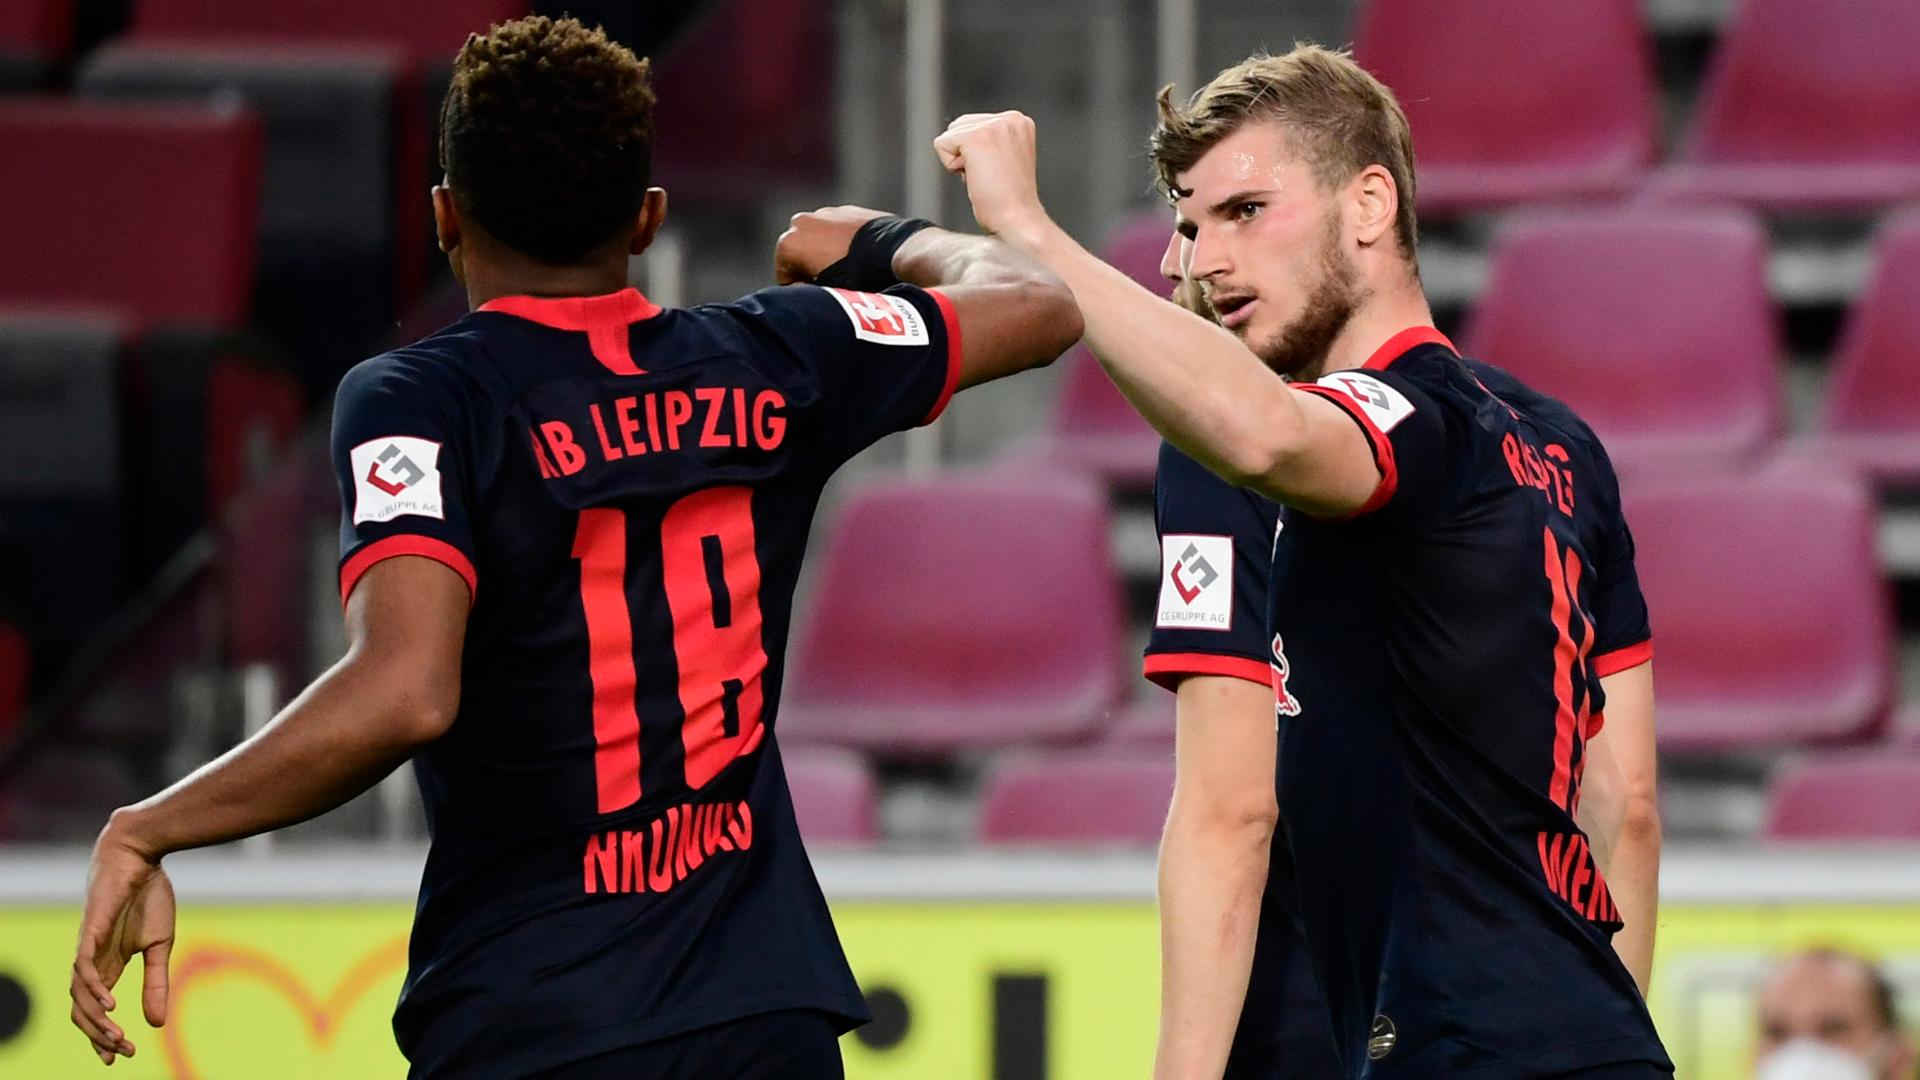 Cologne 2-4 RB Leipzig: Werner on target in return to winning ways